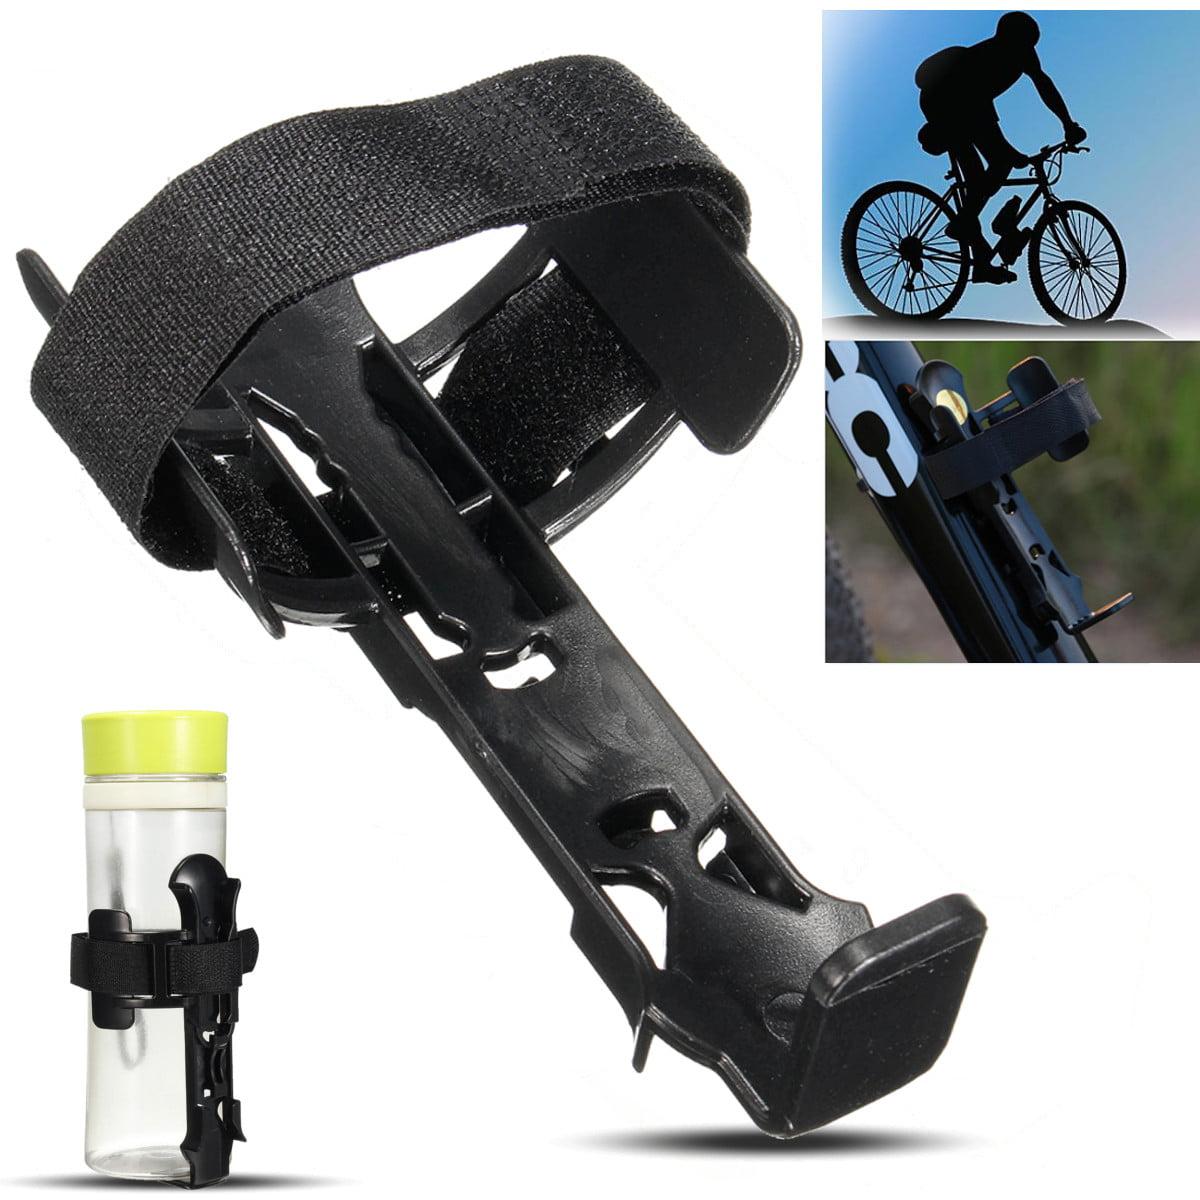 Universal Adjustable MTB Bicycle Mountain Bike Drink Water Bottle Holder  new